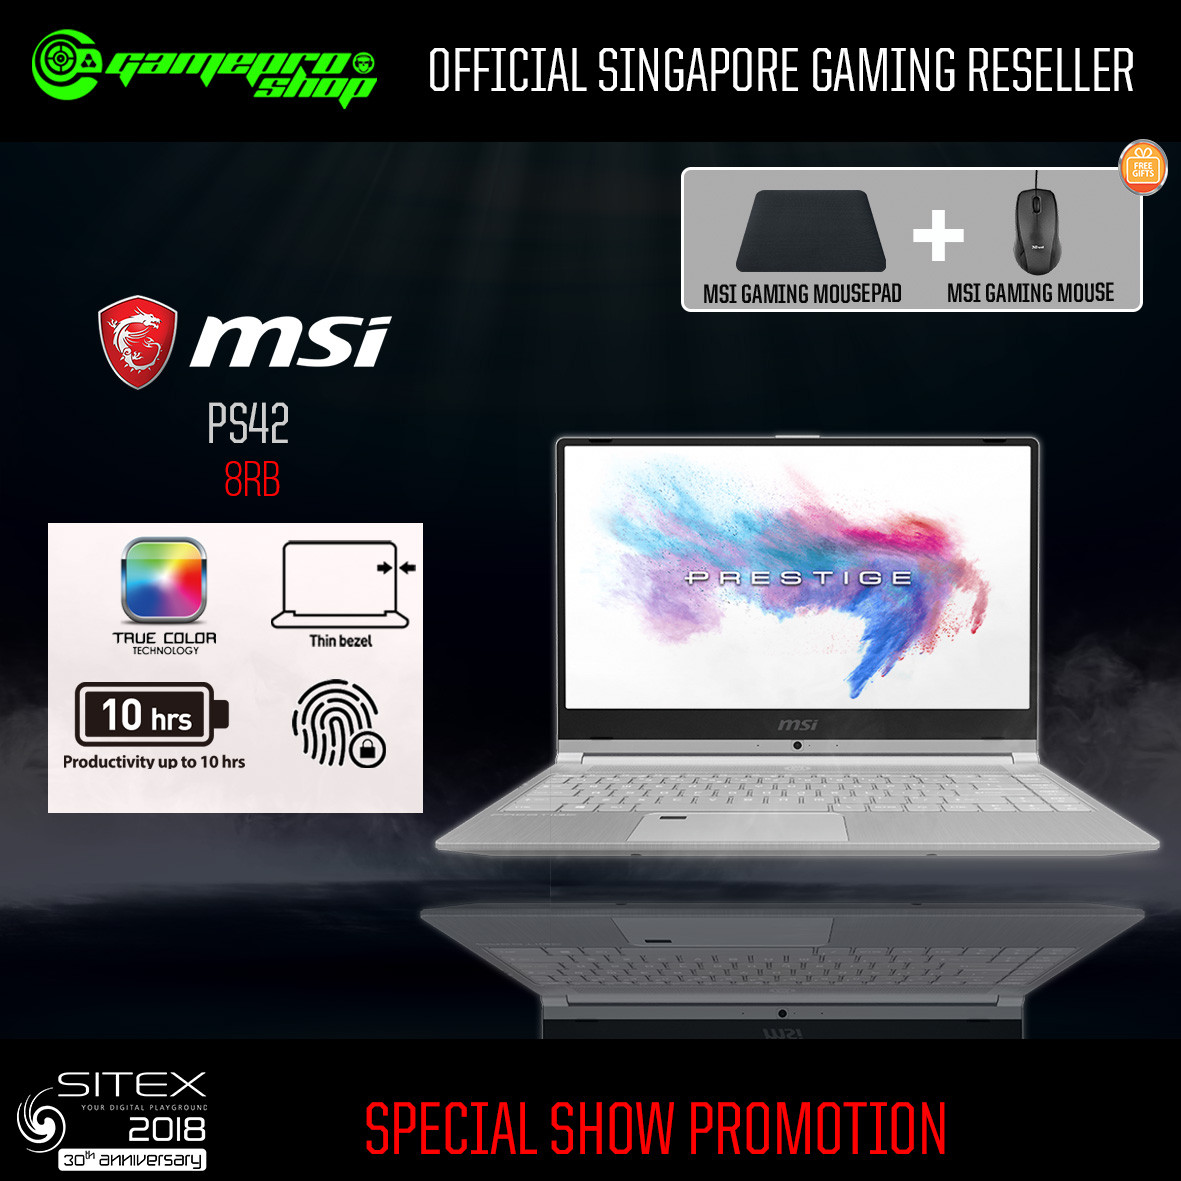 MSI PS42 8RB - 446SG 512GB SSD (Geforce® MX150 2GB GDDR5)